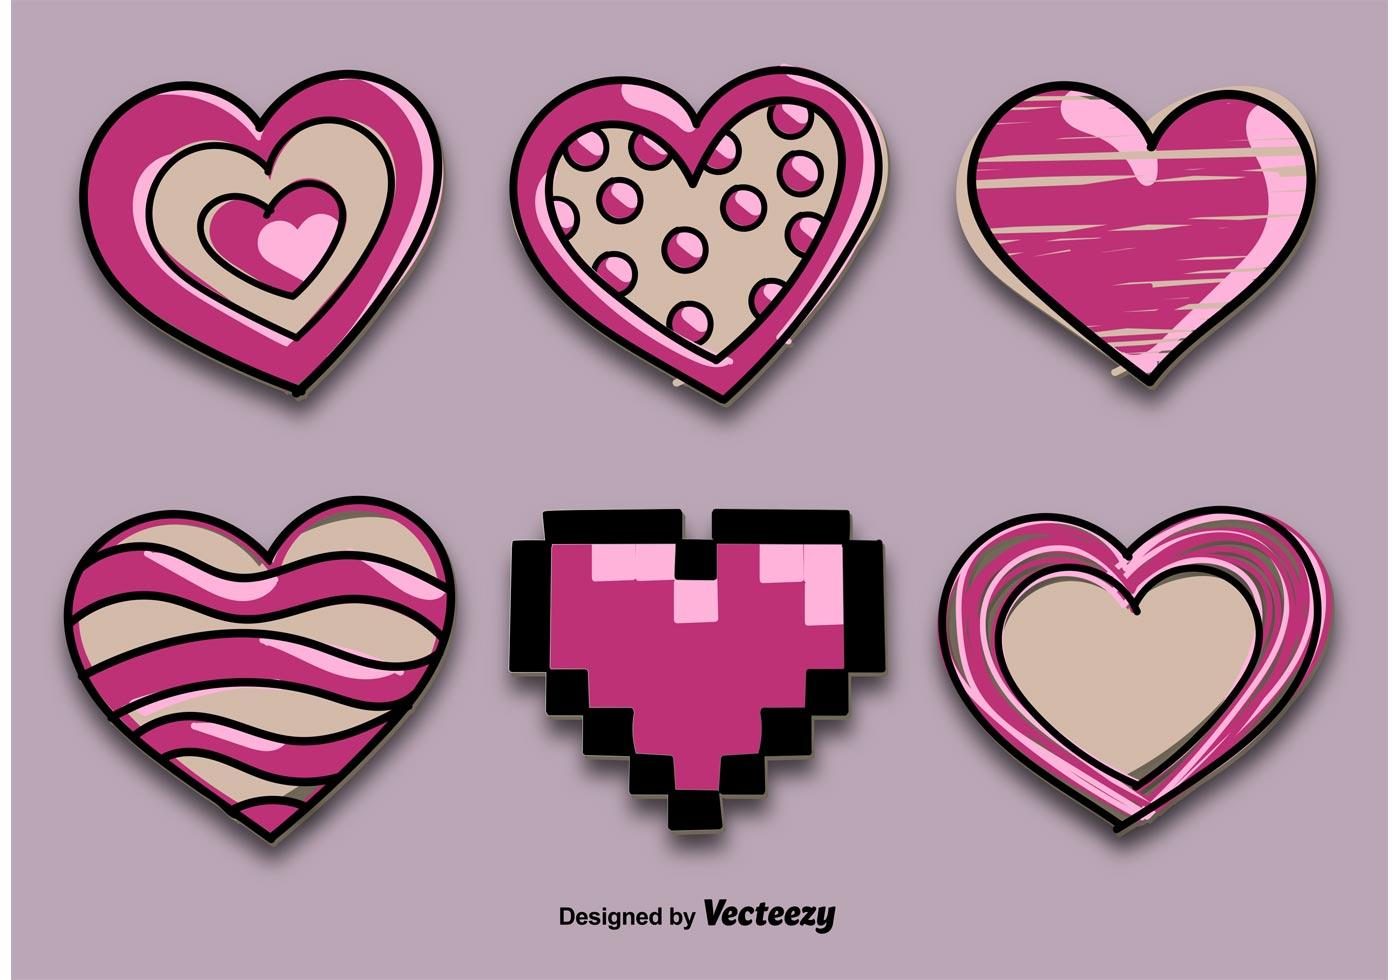 Decorative Drawn Hearts - Download Free Vector Art, Stock ...